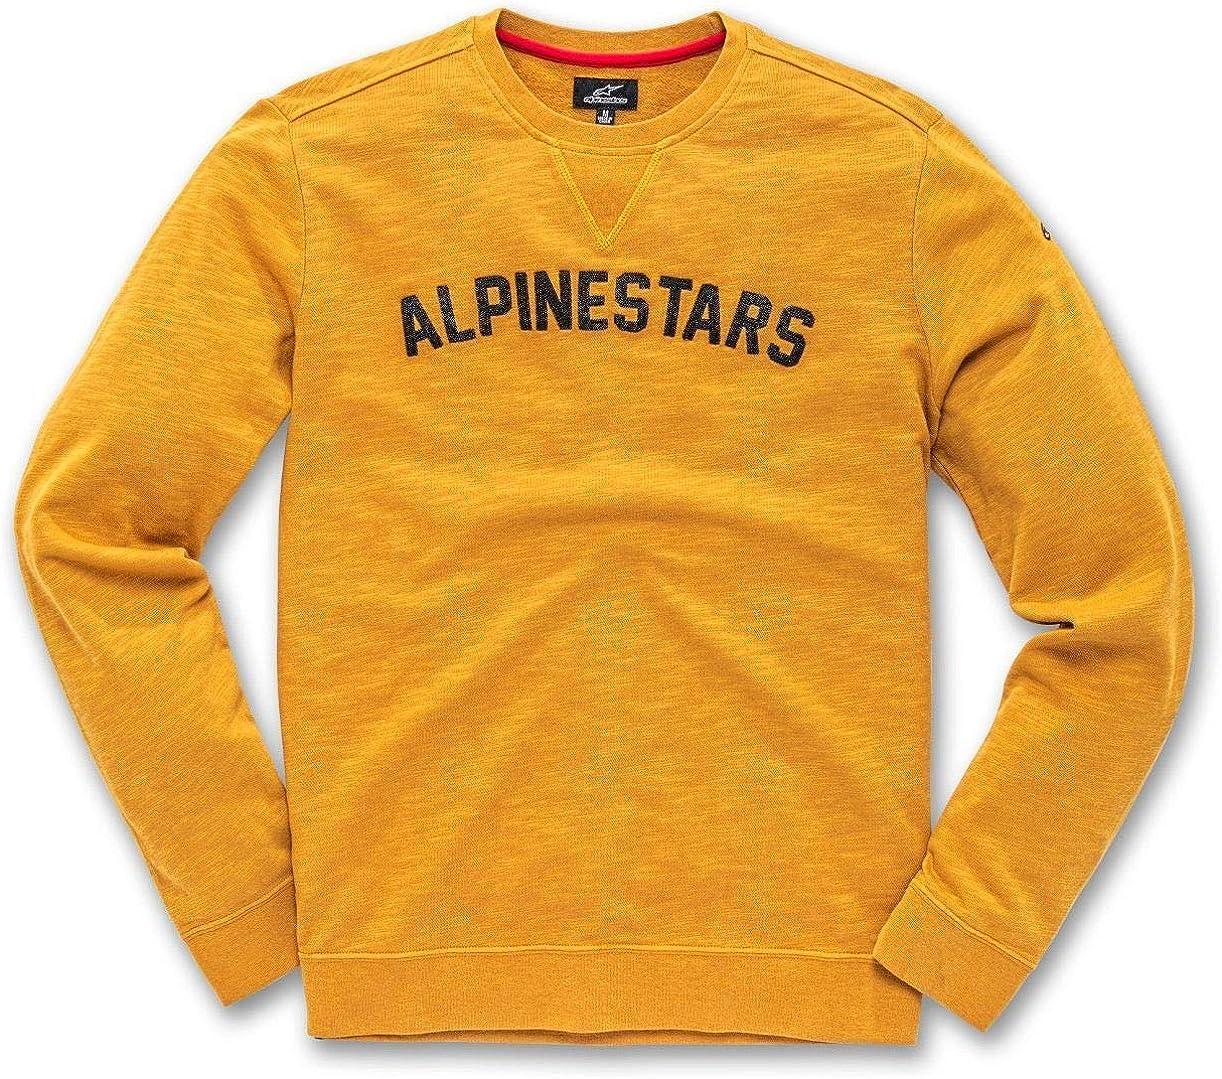 Alpinestars Mens Judgement Sweater